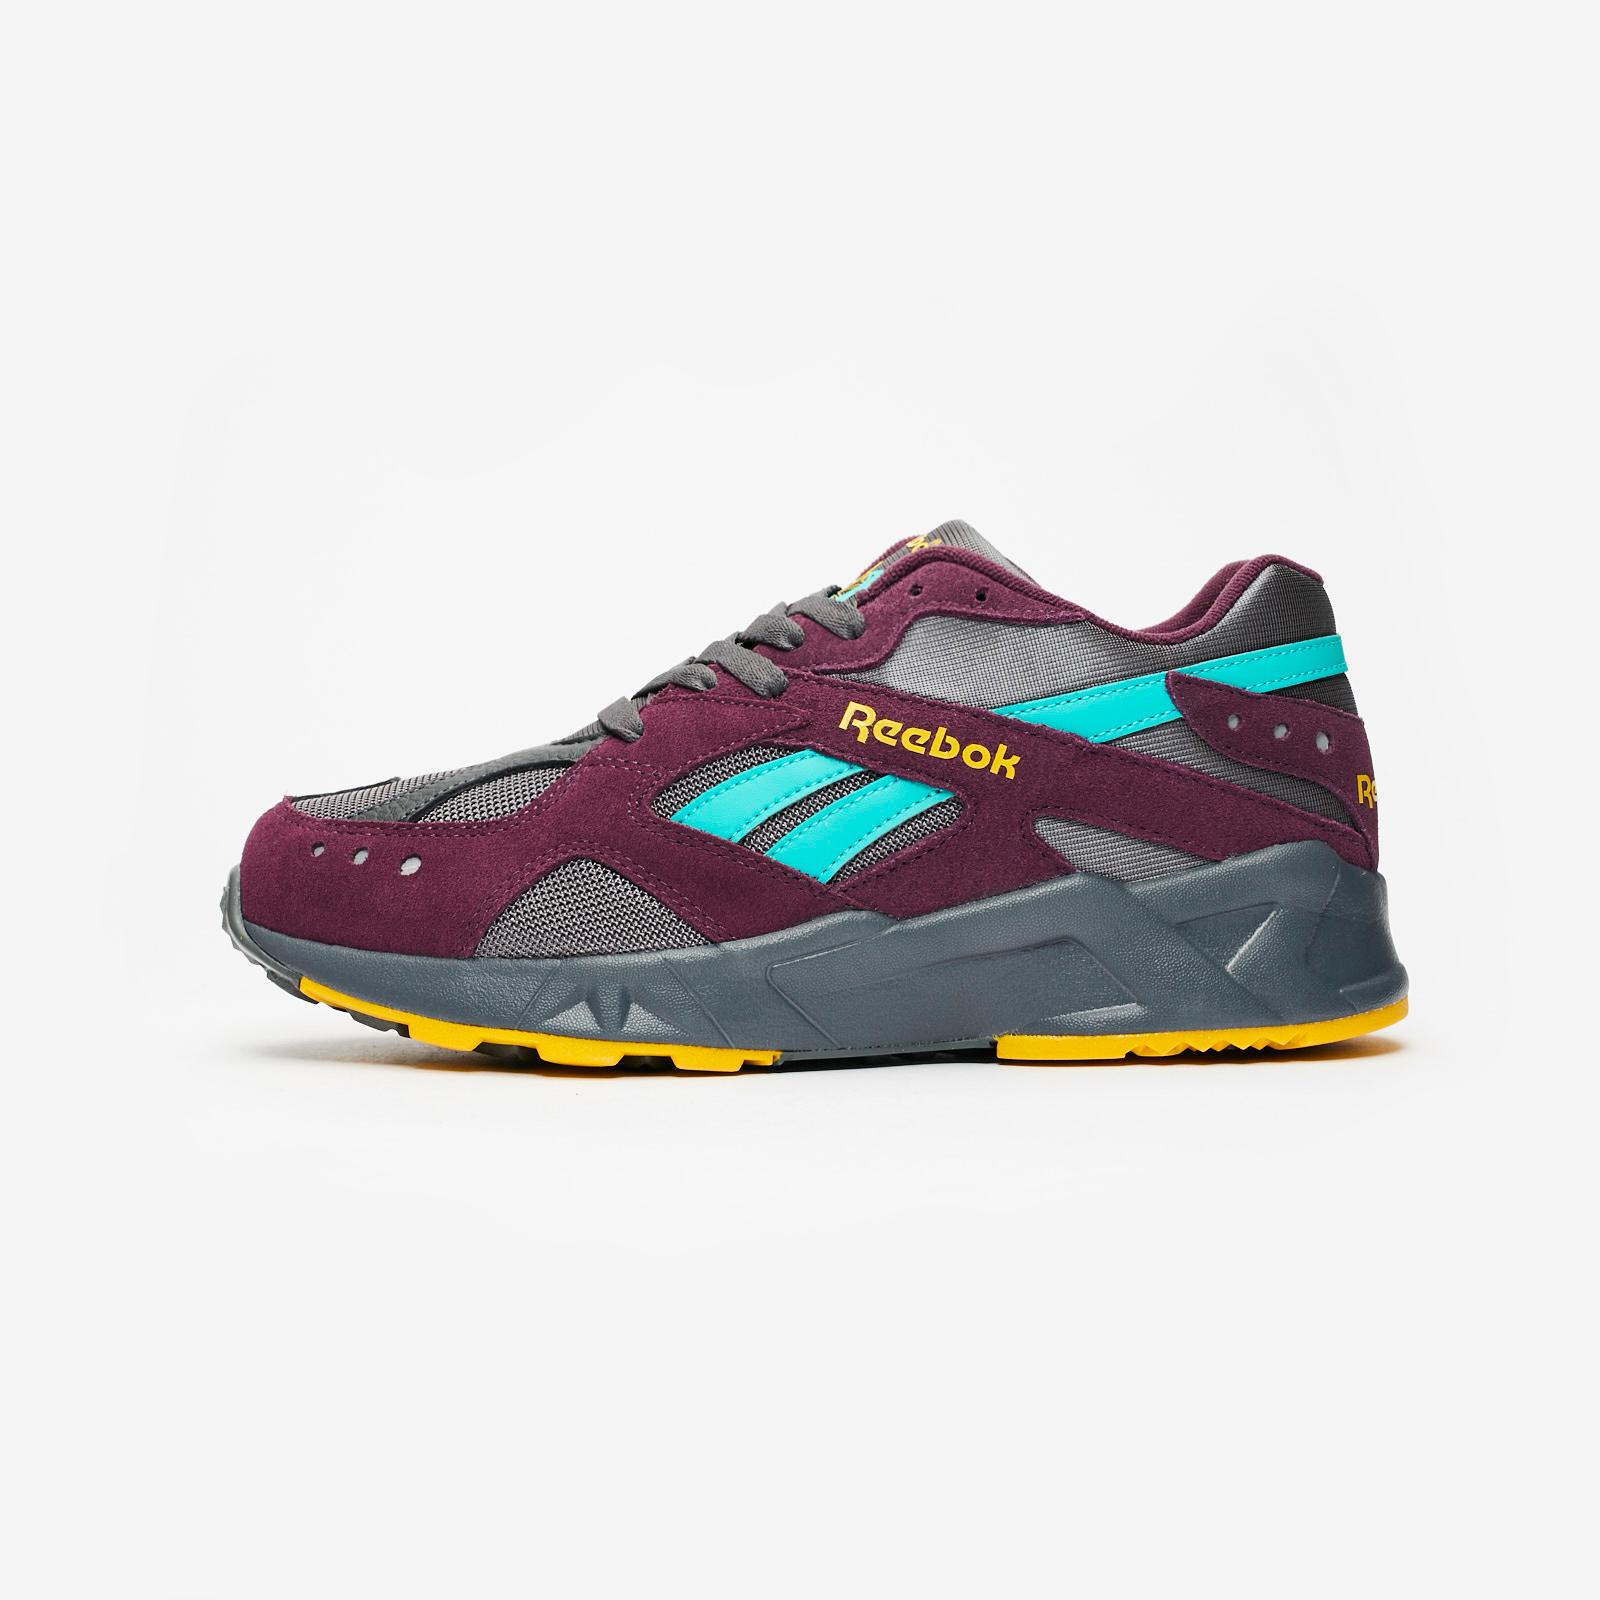 Reebok Aztrek - Cn7837 - Sneakersnstuff